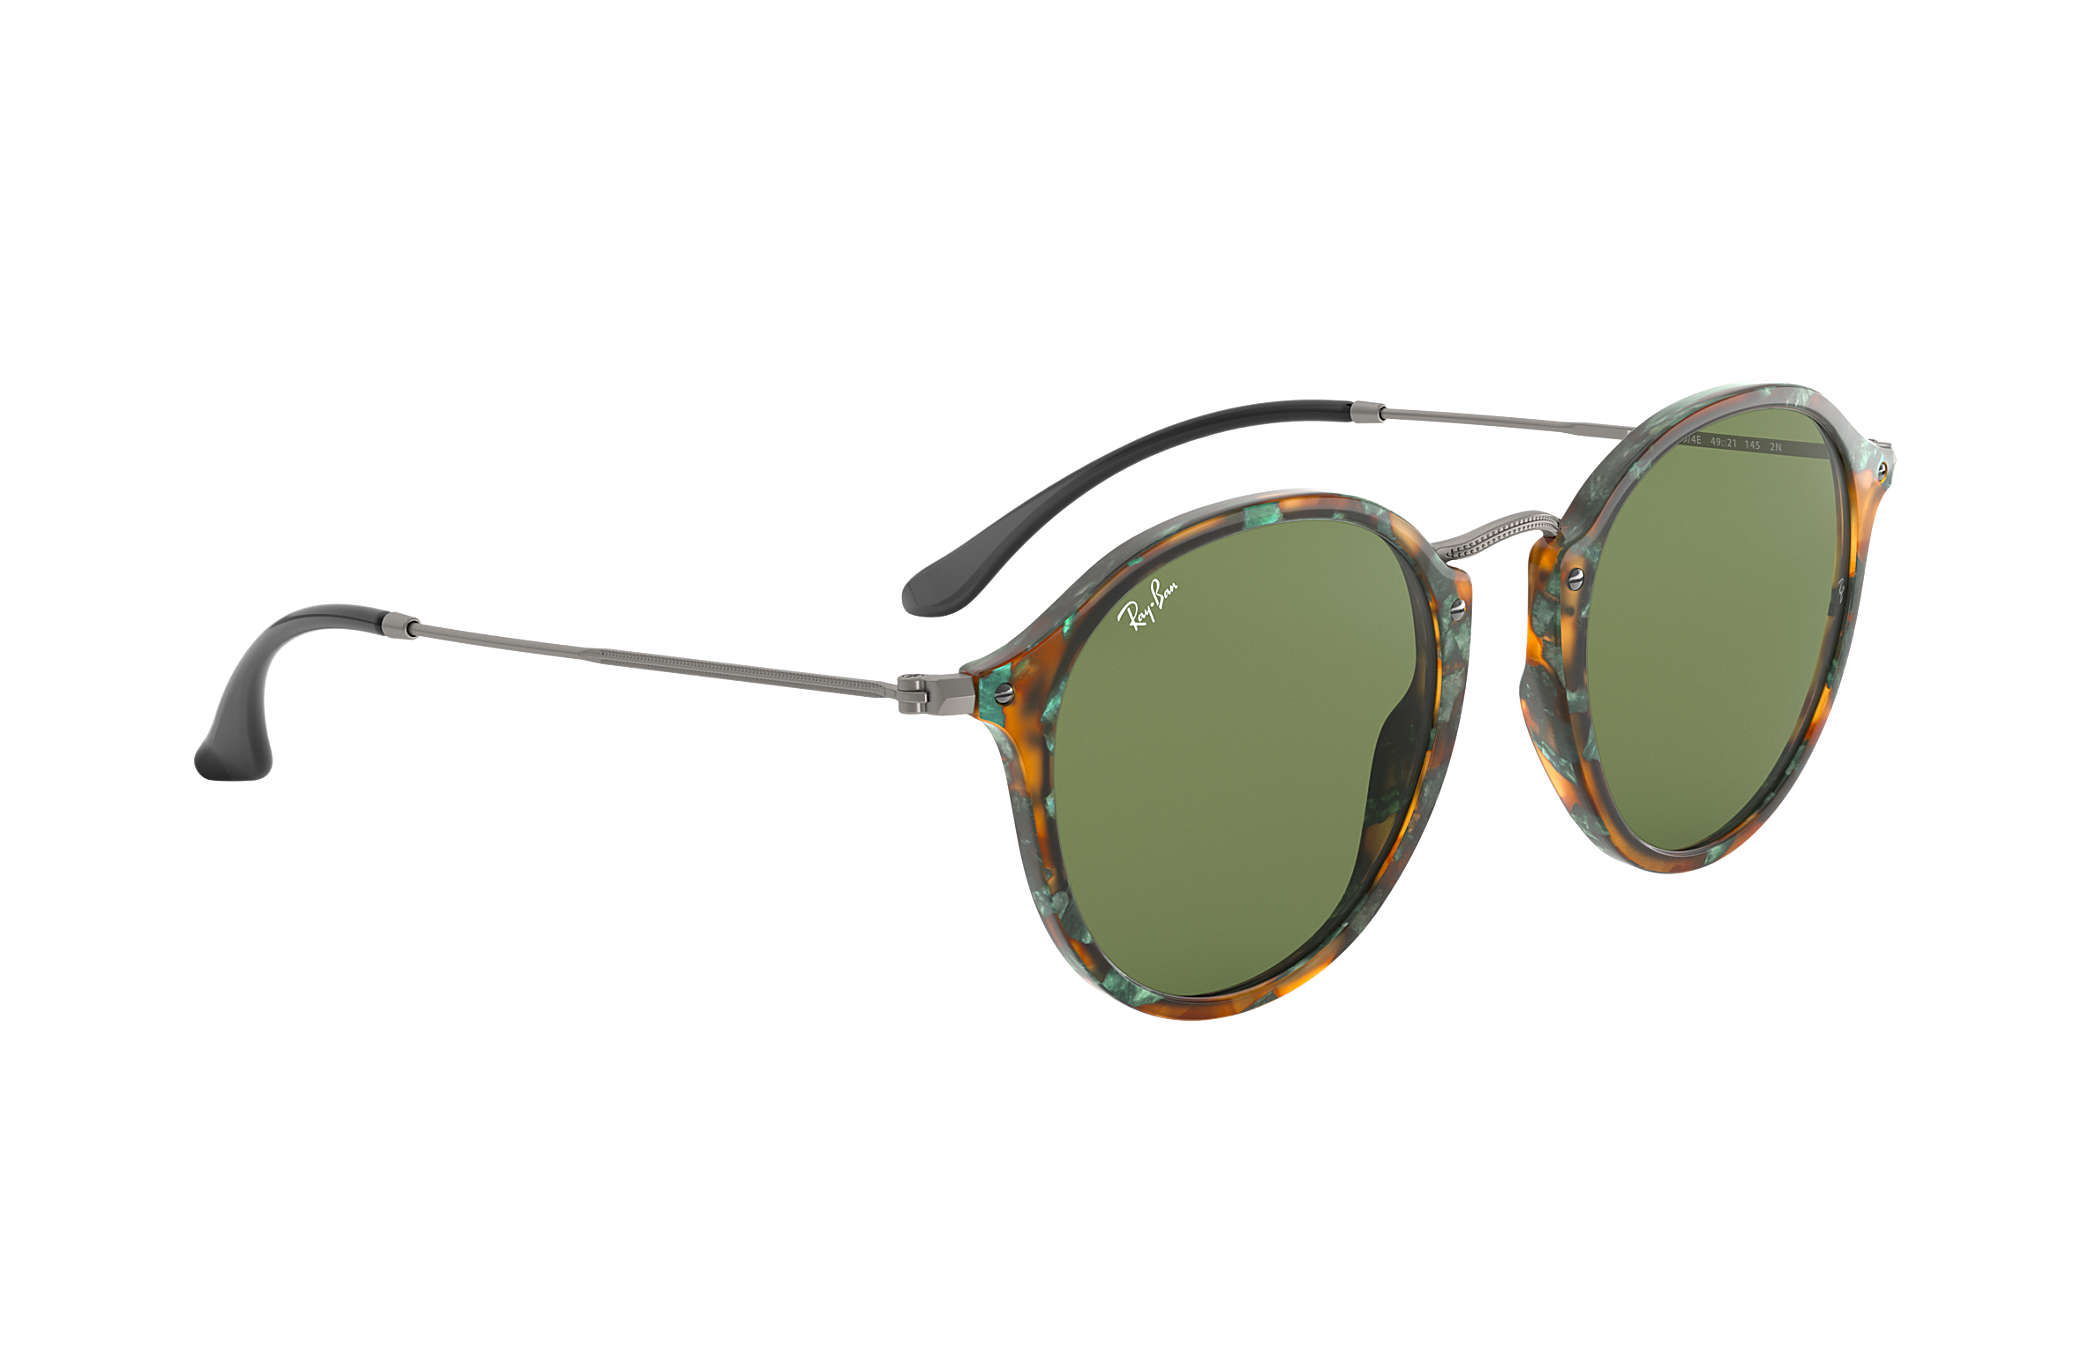 0dabdd1efe Ray-Ban Round Fleck RB2447 Tortoise - Acetate - Green Lenses ...